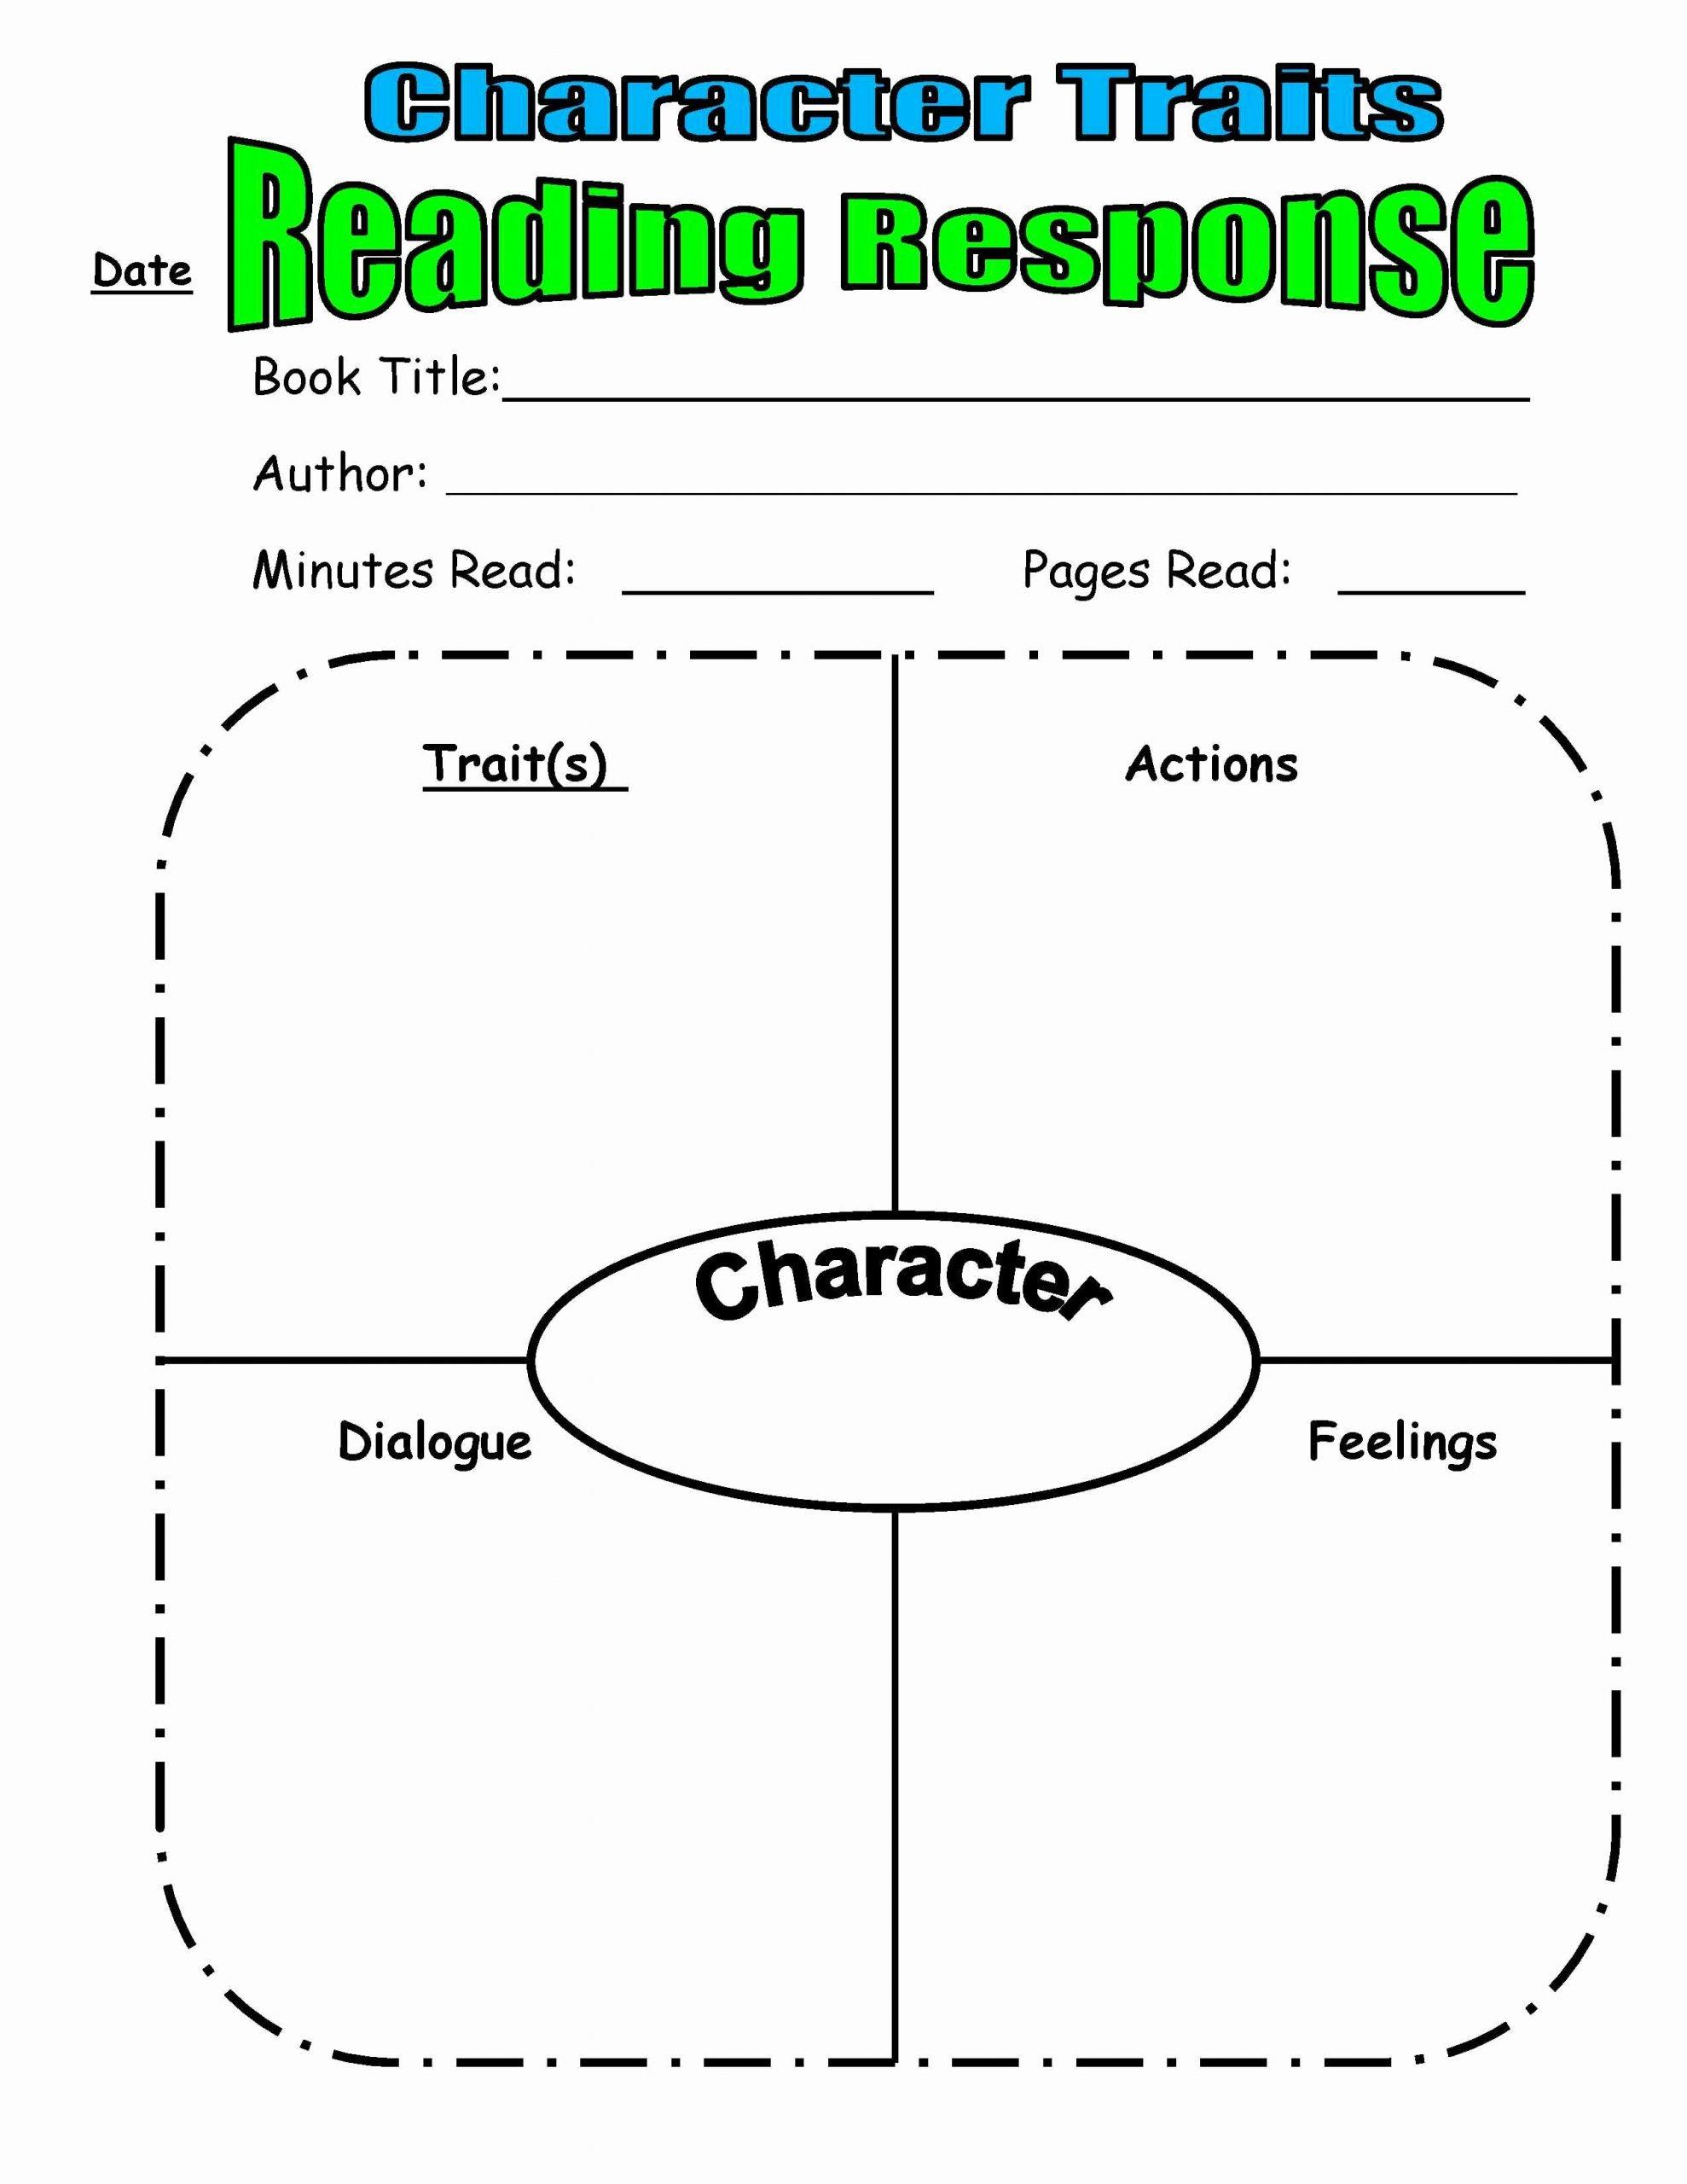 Character Traits Worksheet 4th Grade Fresh Teaching Character Traits In Reader S Workshop